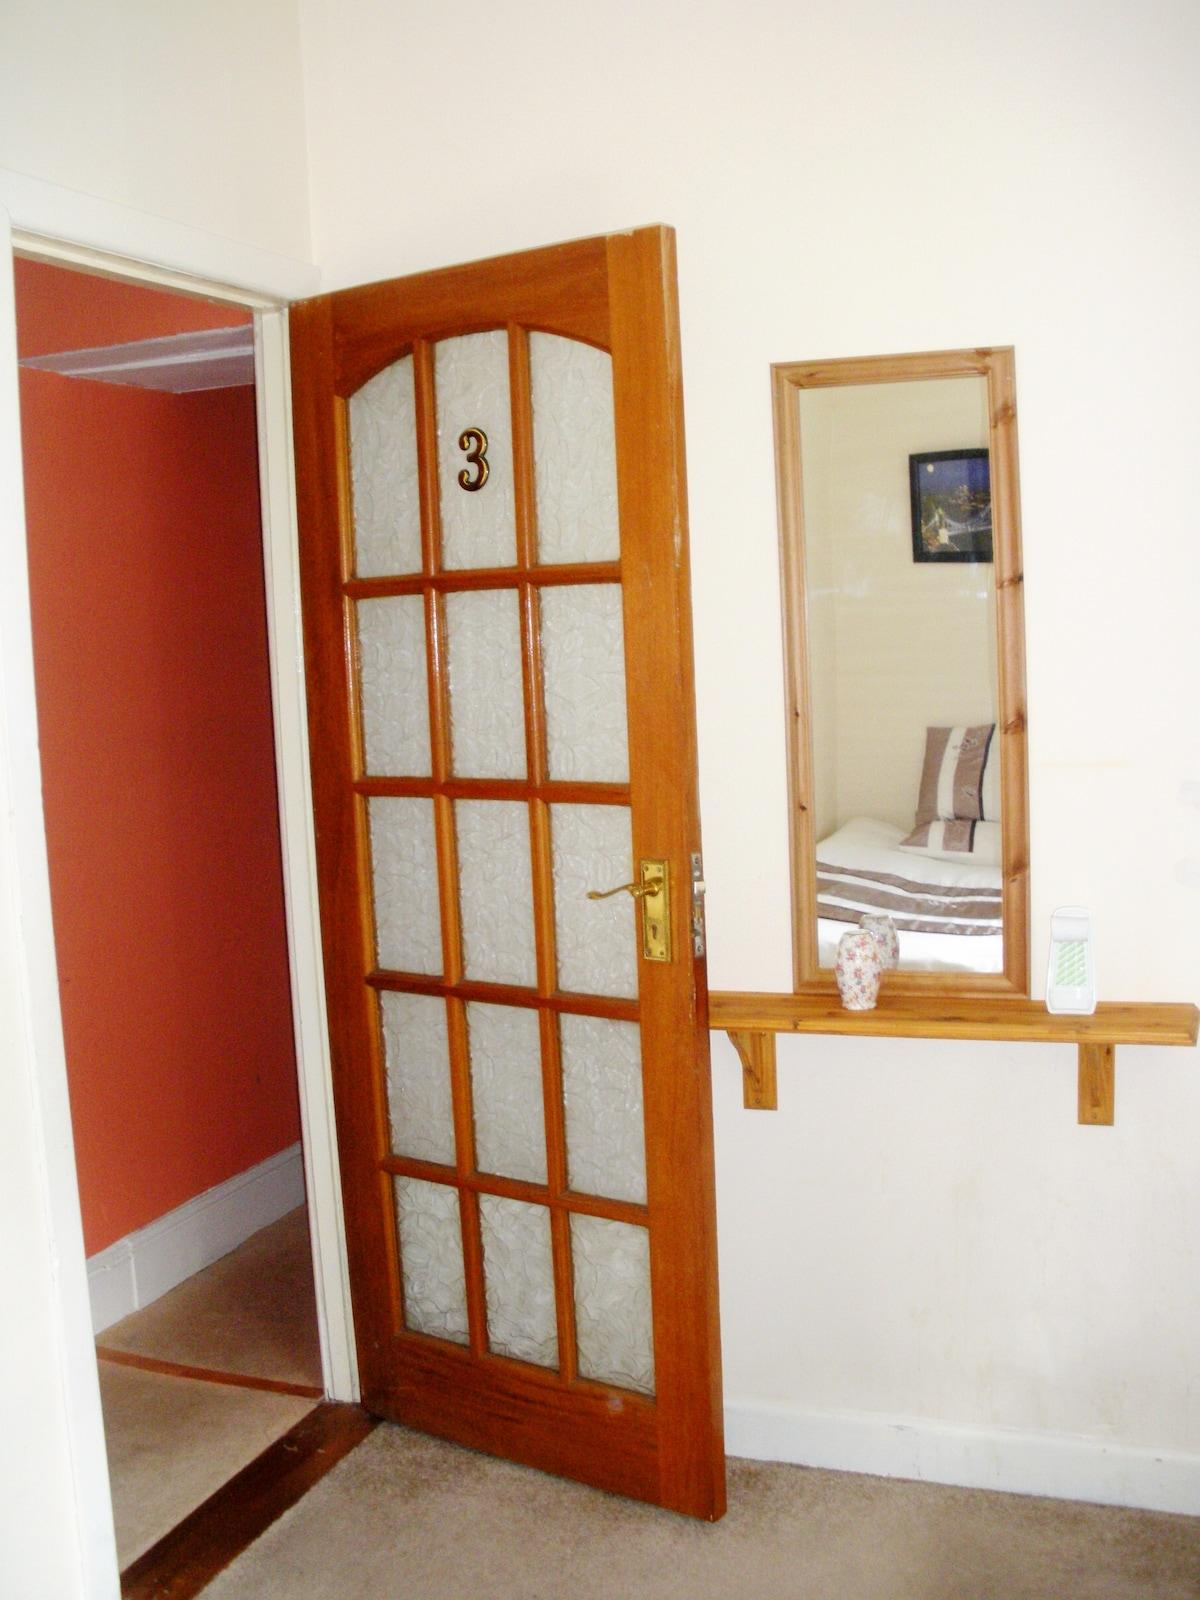 The room's door and hall behind